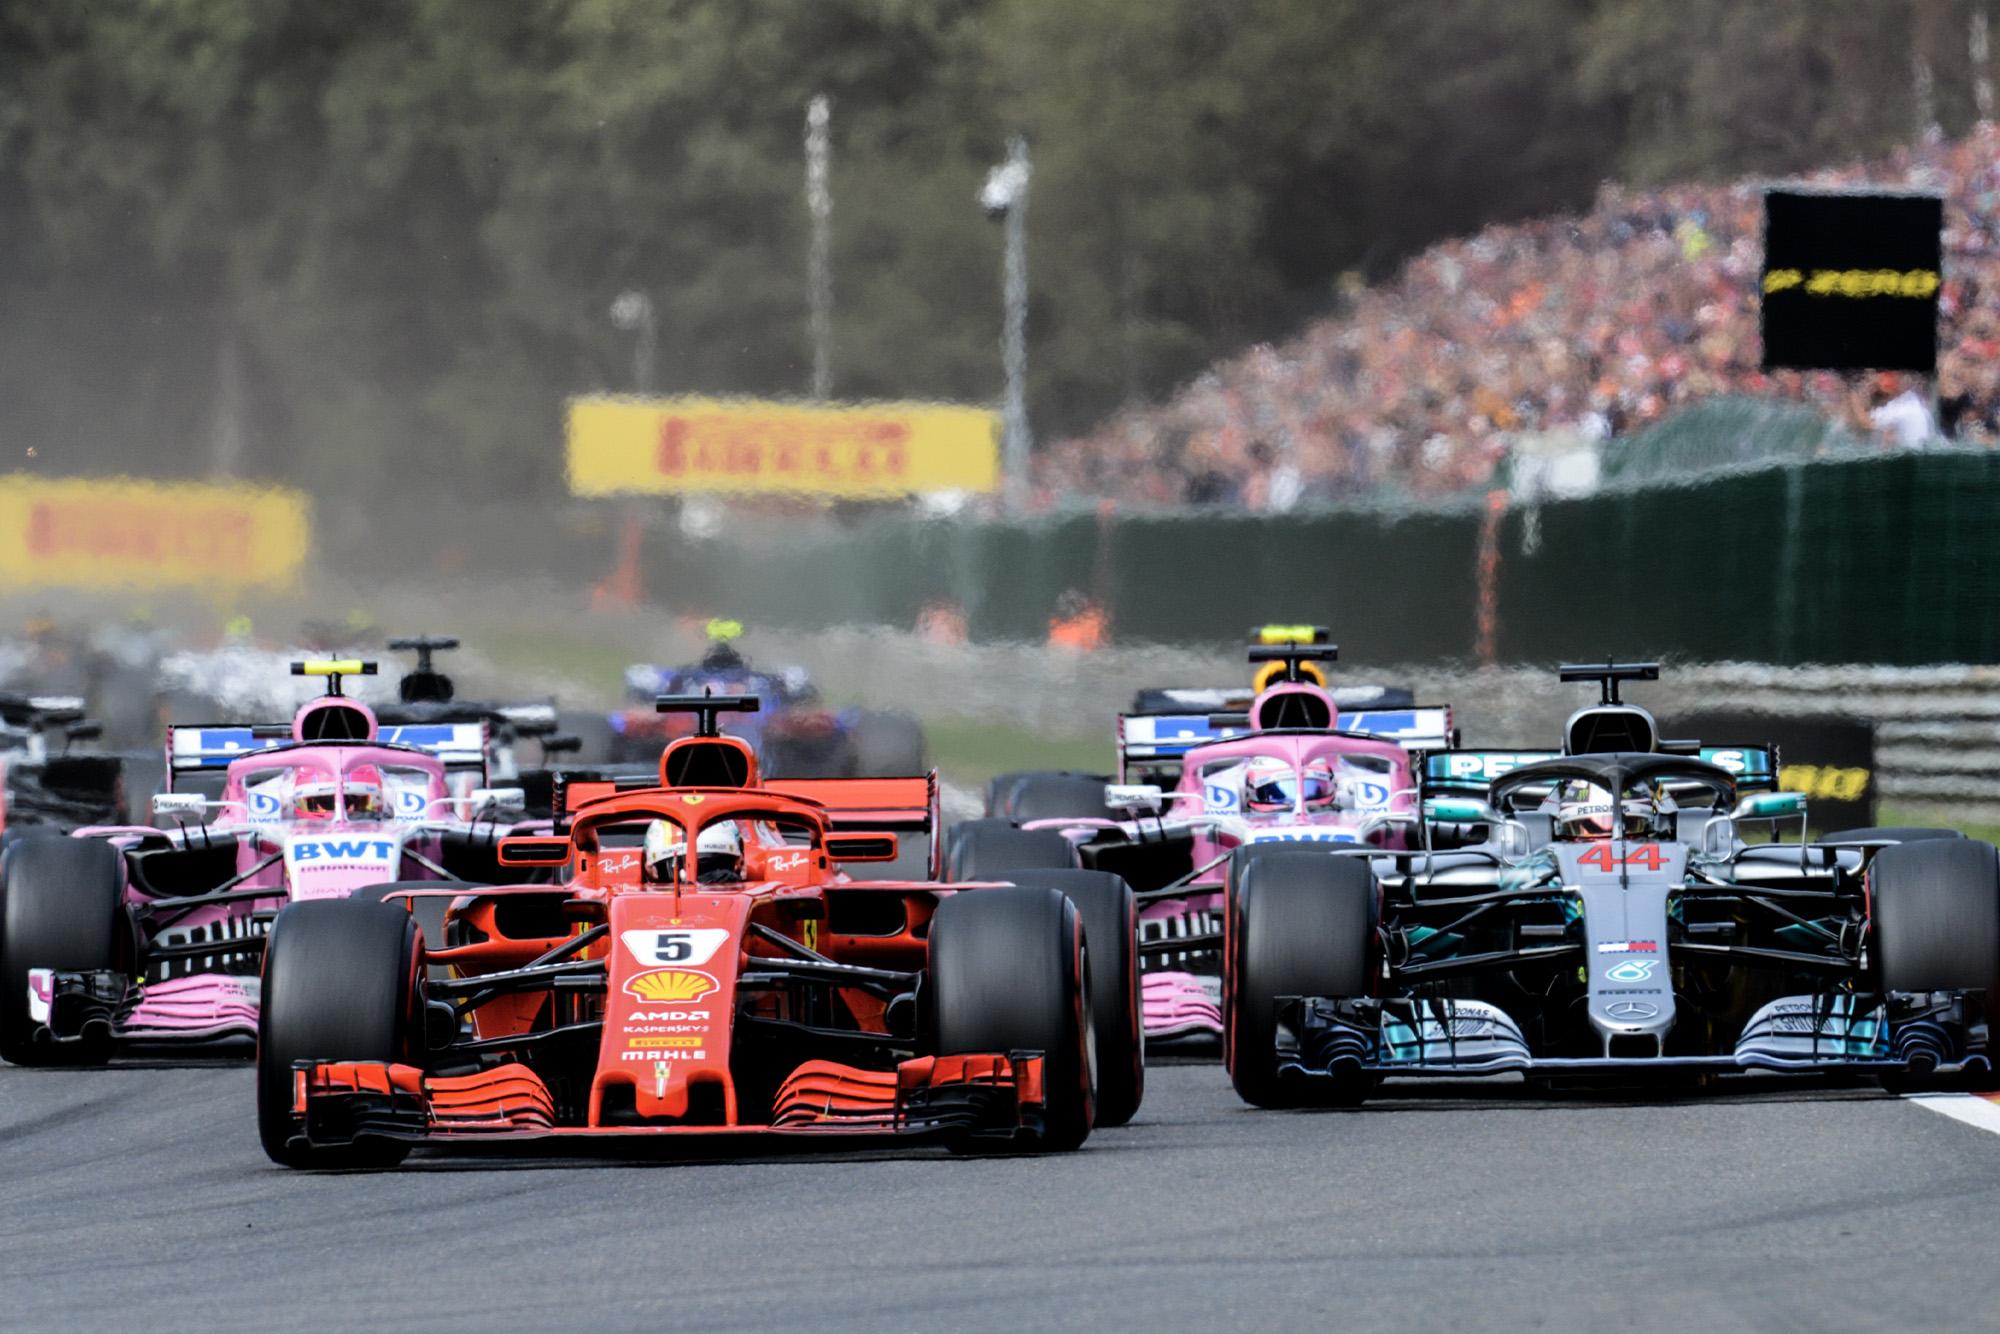 2019 Belgian Grand Prix start